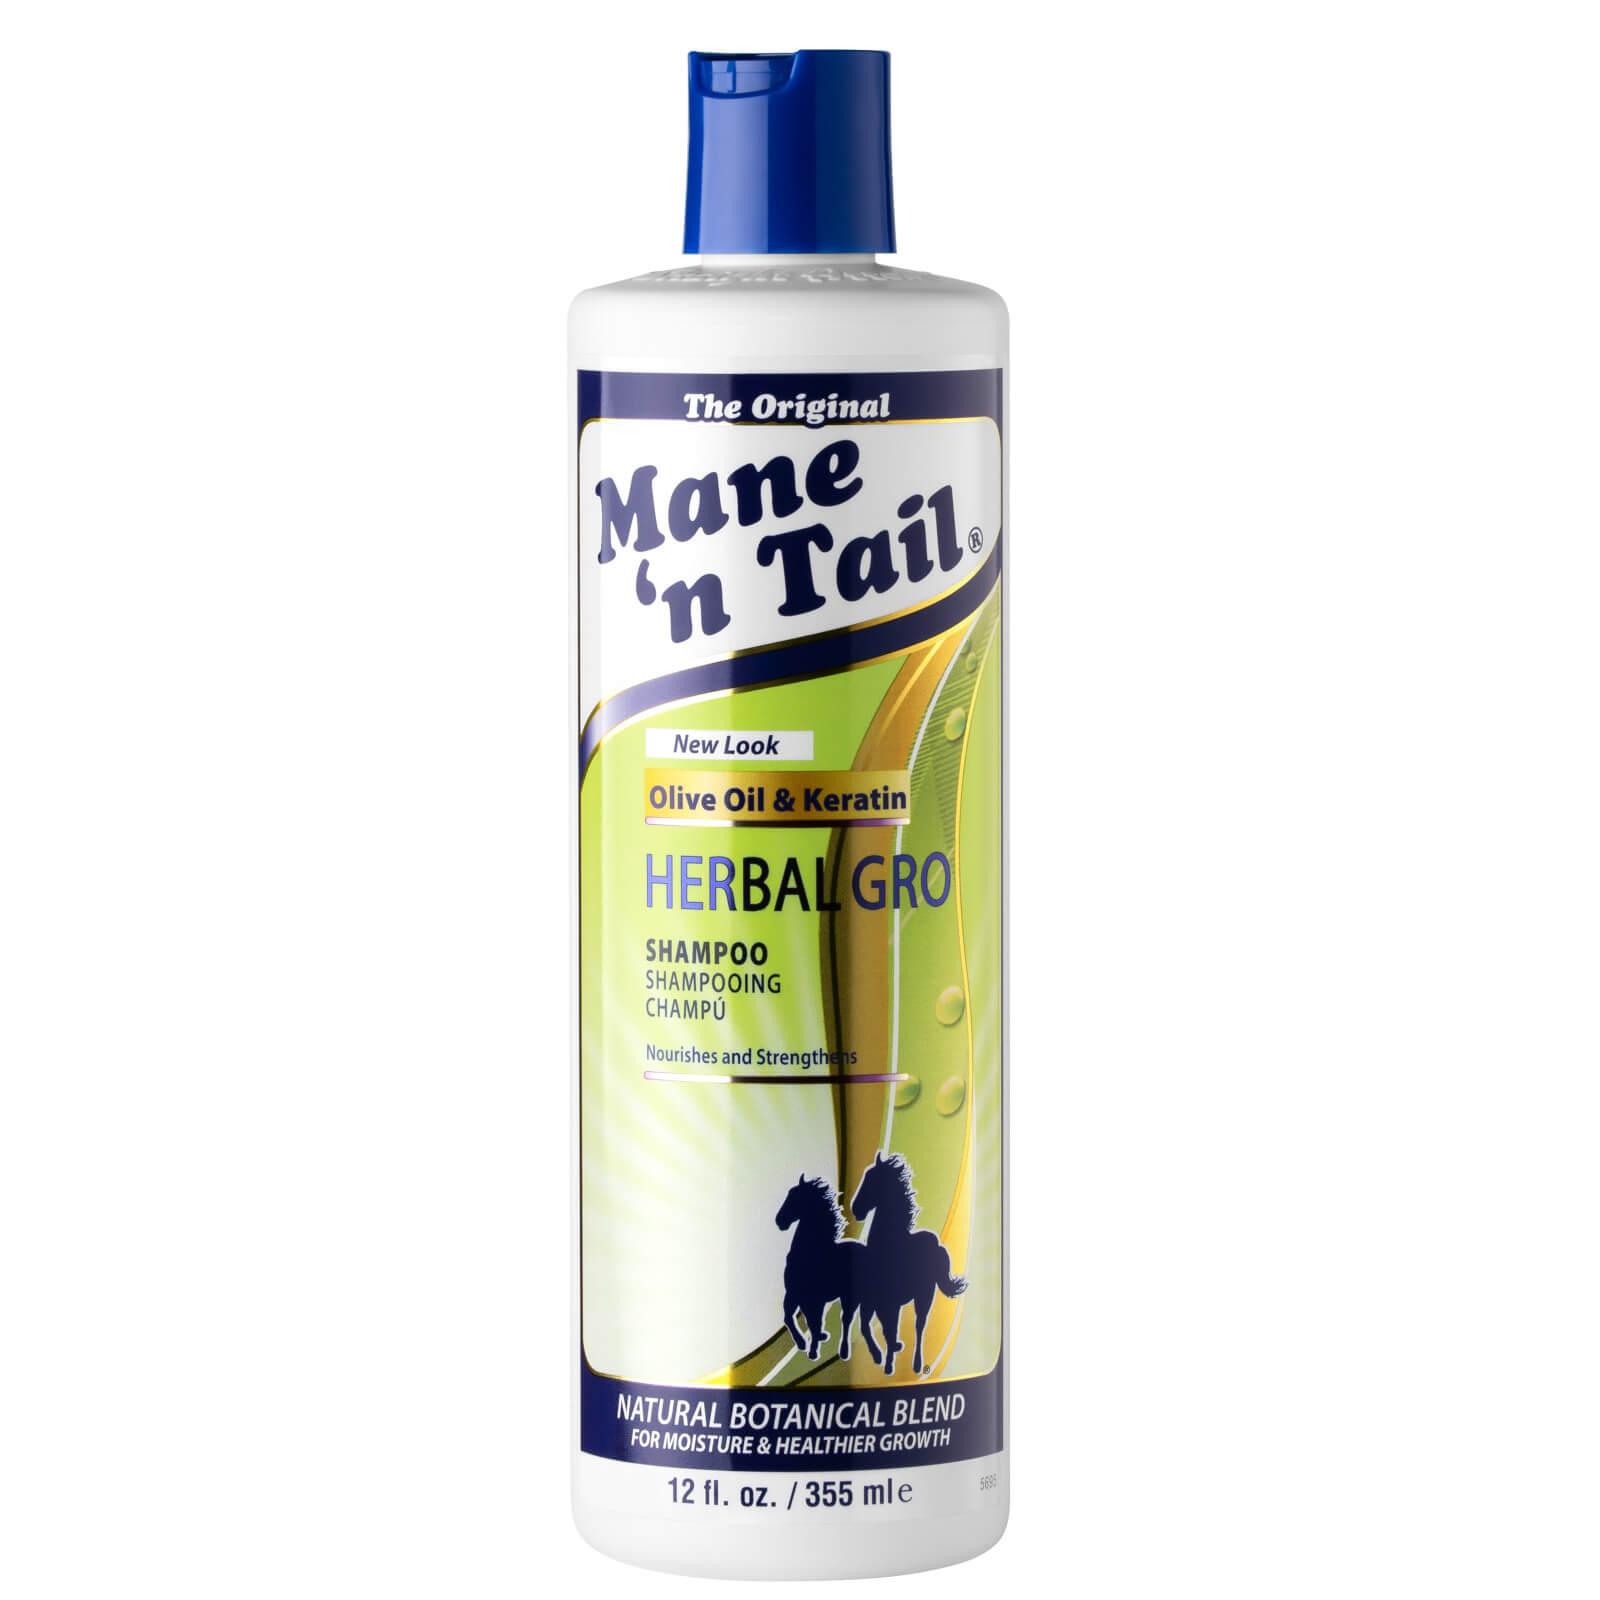 Купить Mane 'n Tail Herbal Gro Shampoo 355ml